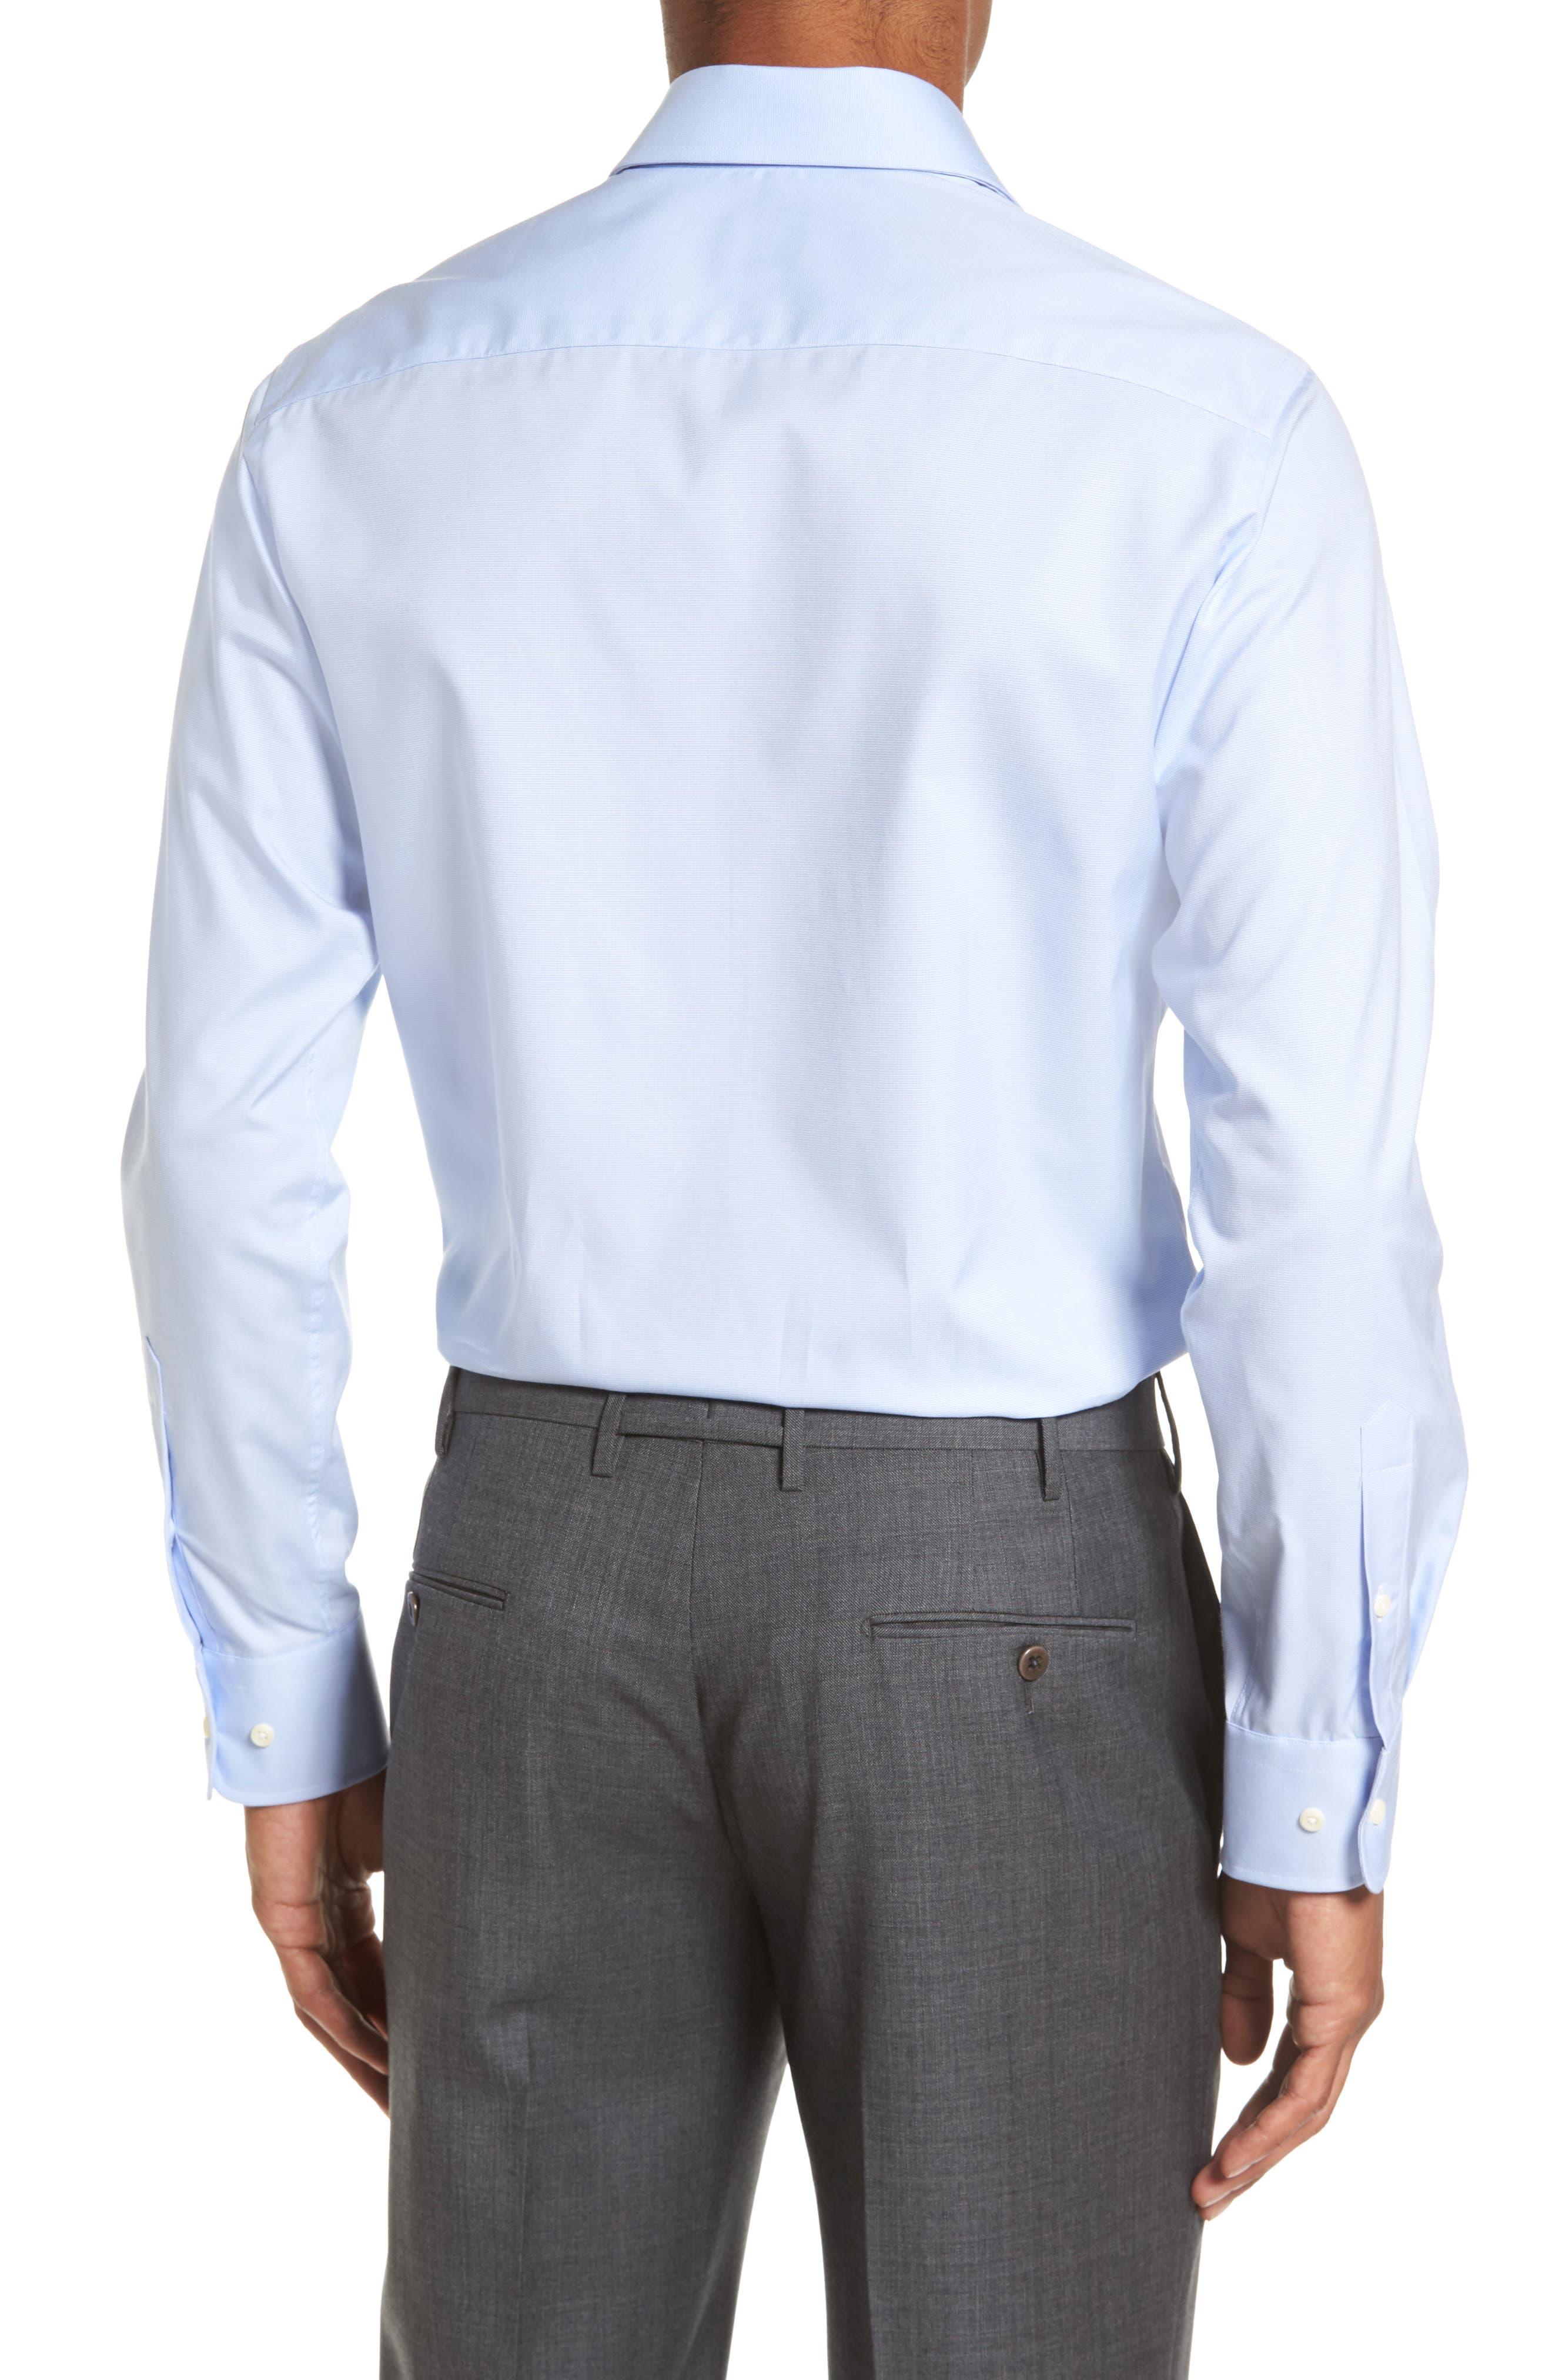 DAVID DONAHUE,                             Slim Fit Solid Dress Shirt,                             Alternate thumbnail 2, color,                             SKY